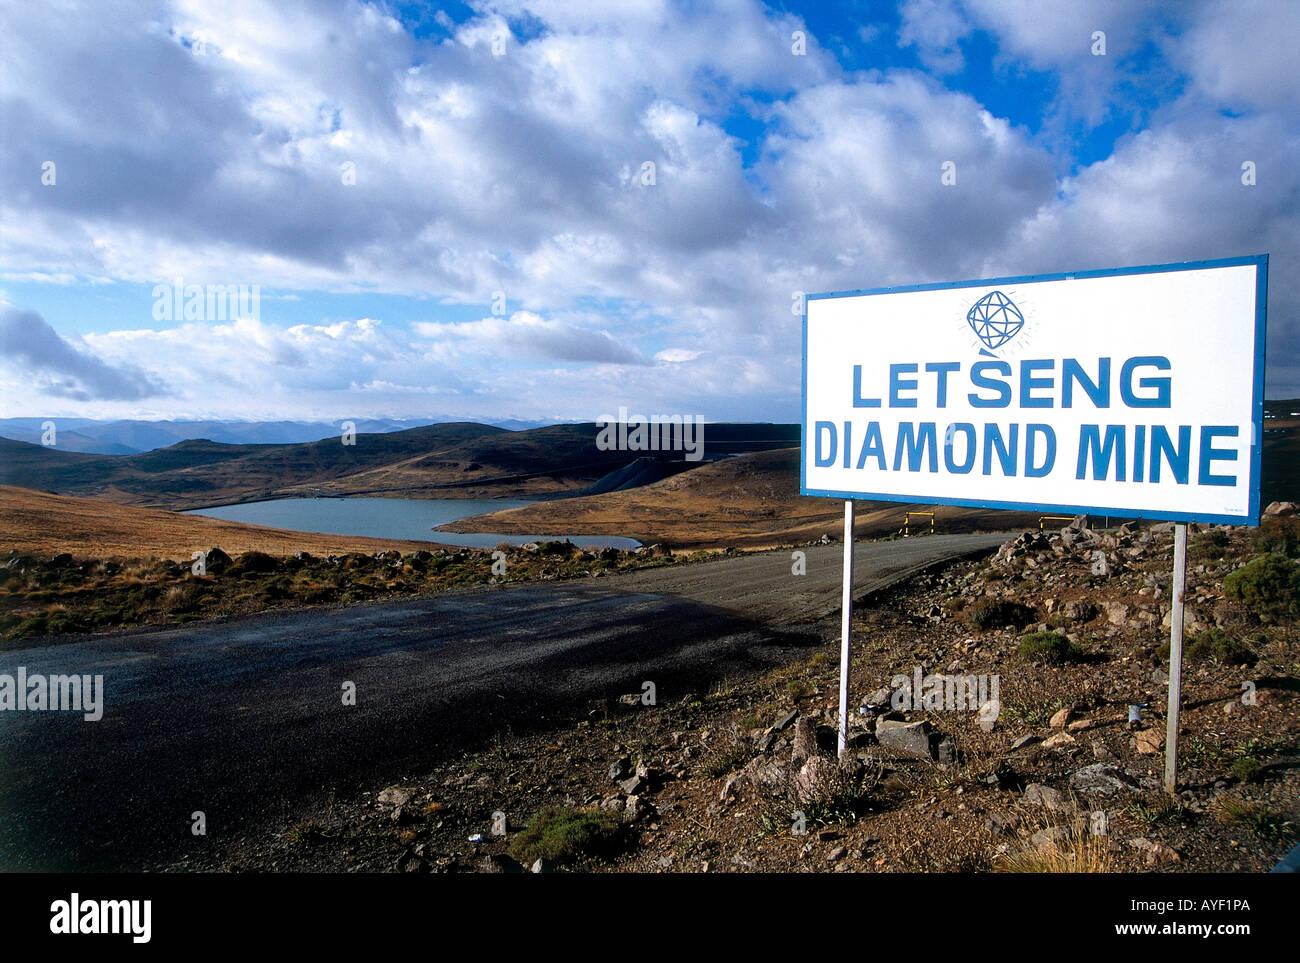 Detalle de Letseng signo de la mina de diamantes en la carretera de Oxbow de Mokhotlong mostrando escaso campo Foto de stock